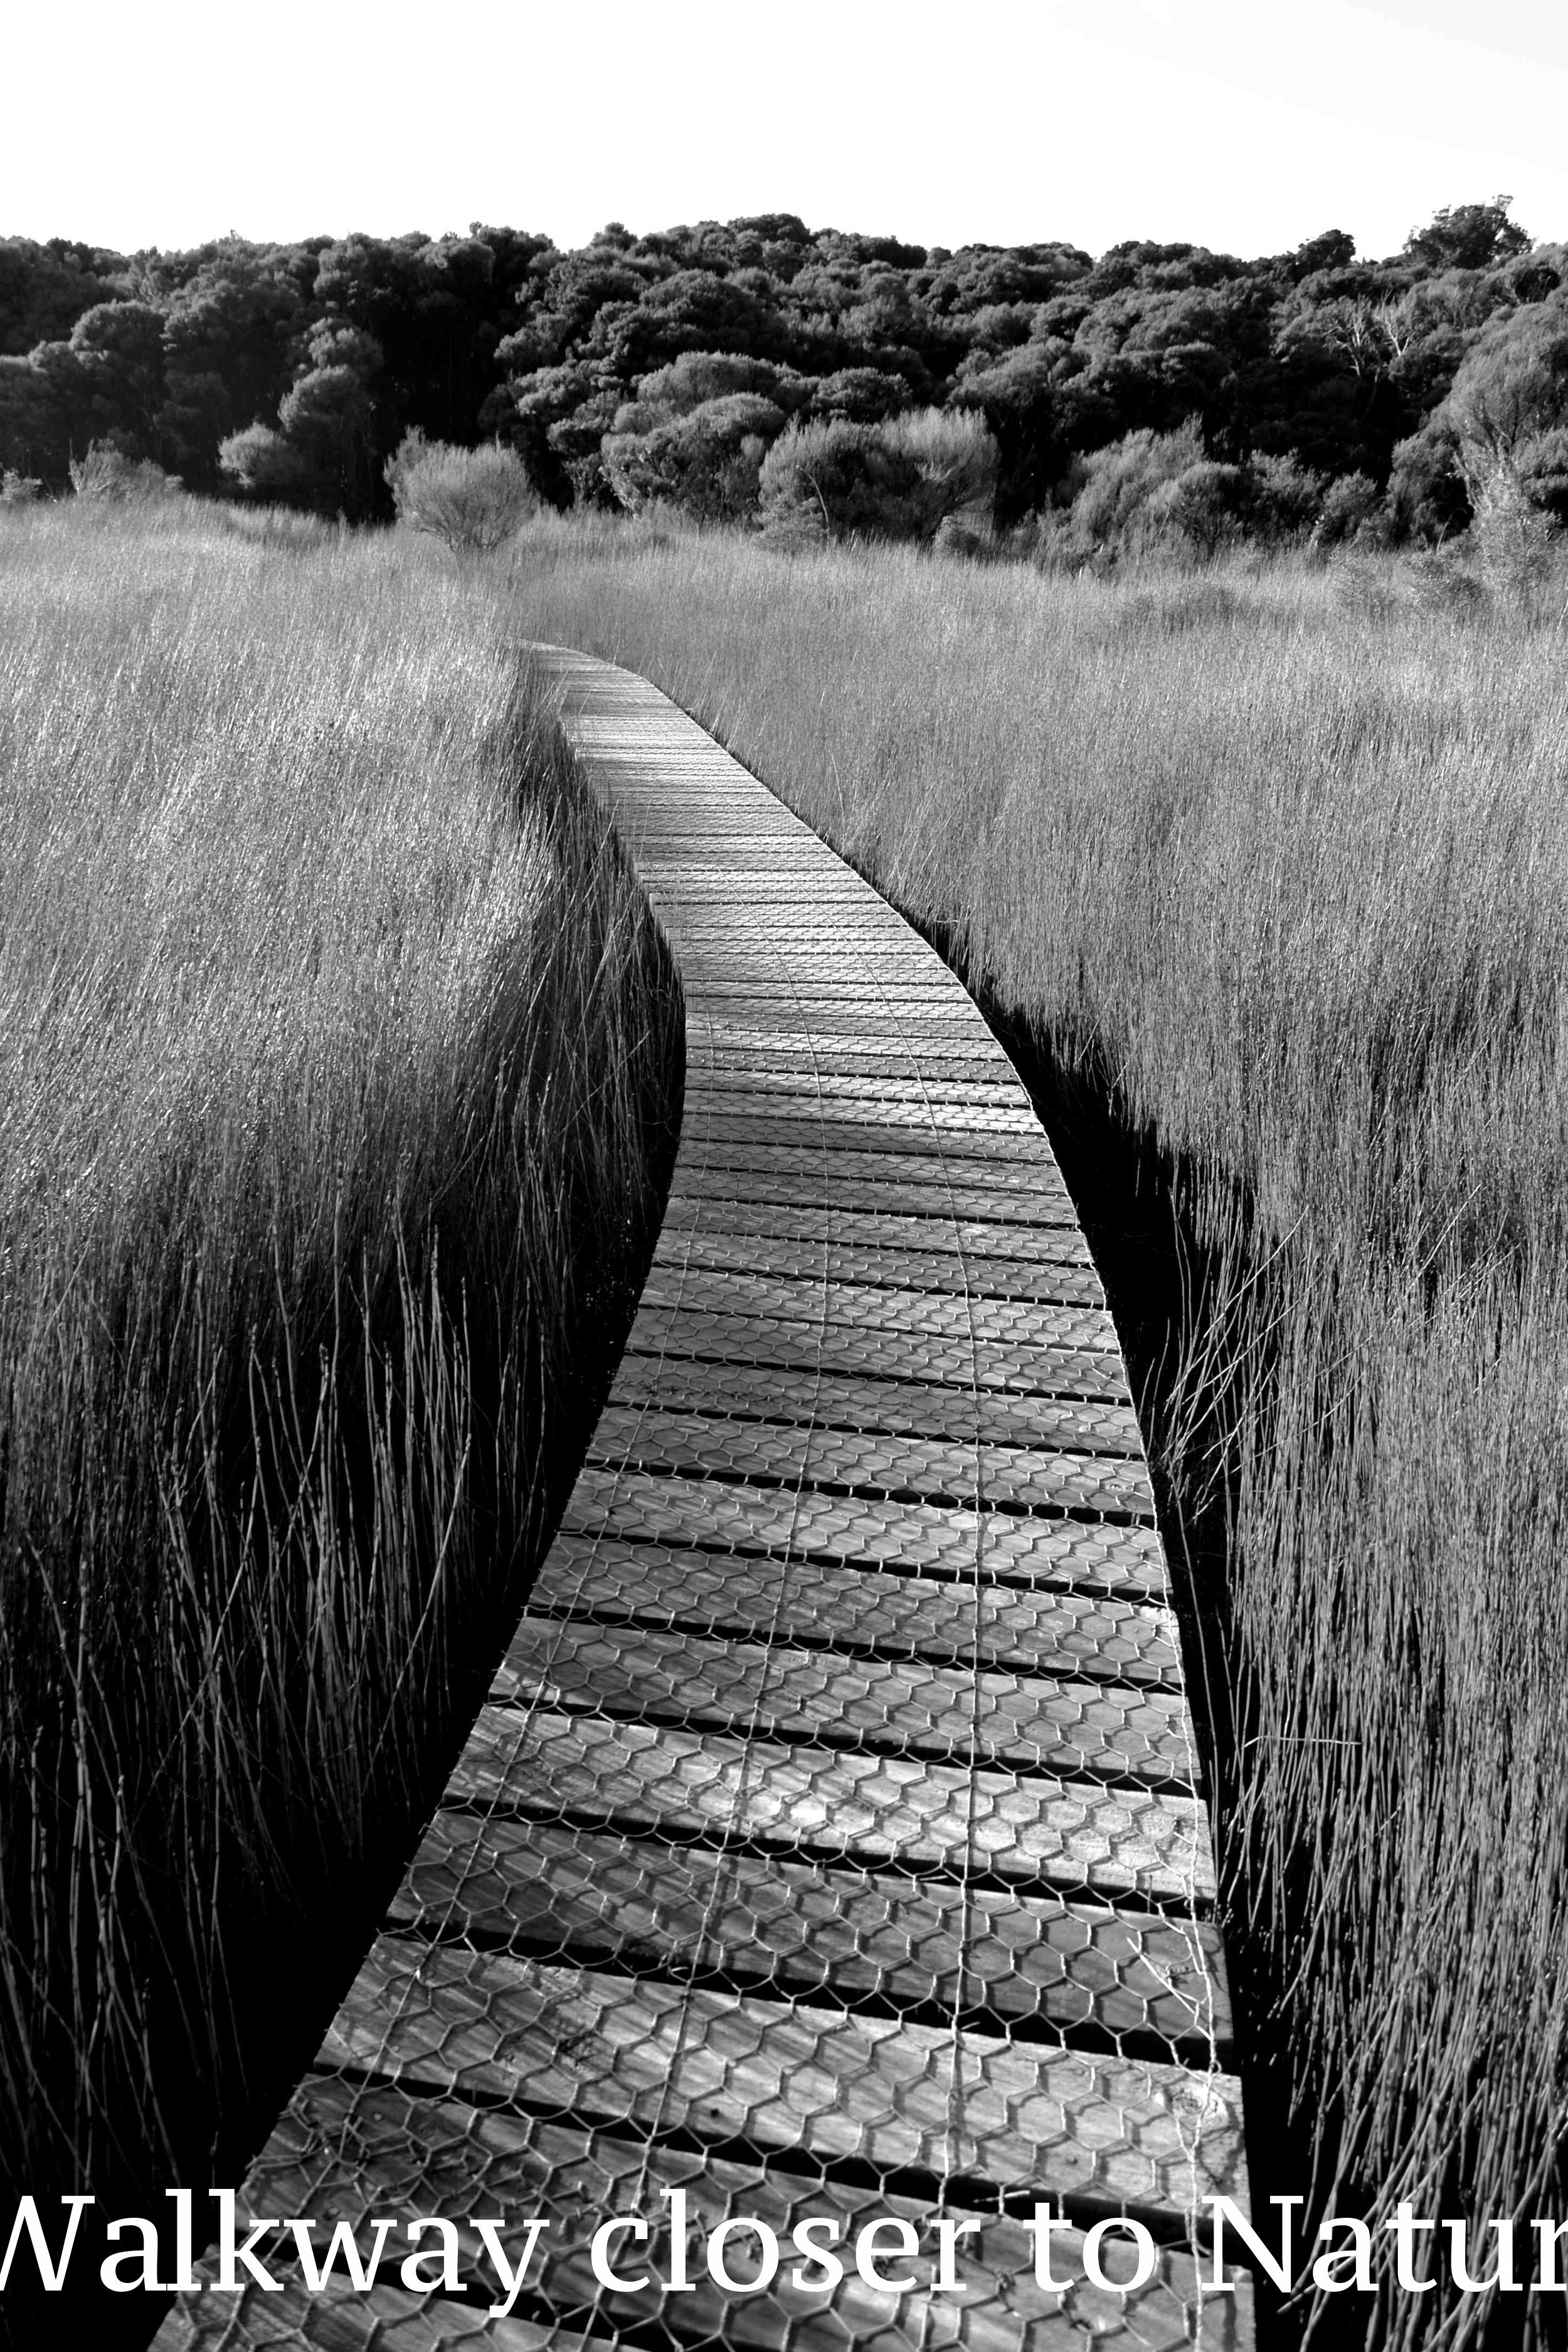 Walkway closer to nature